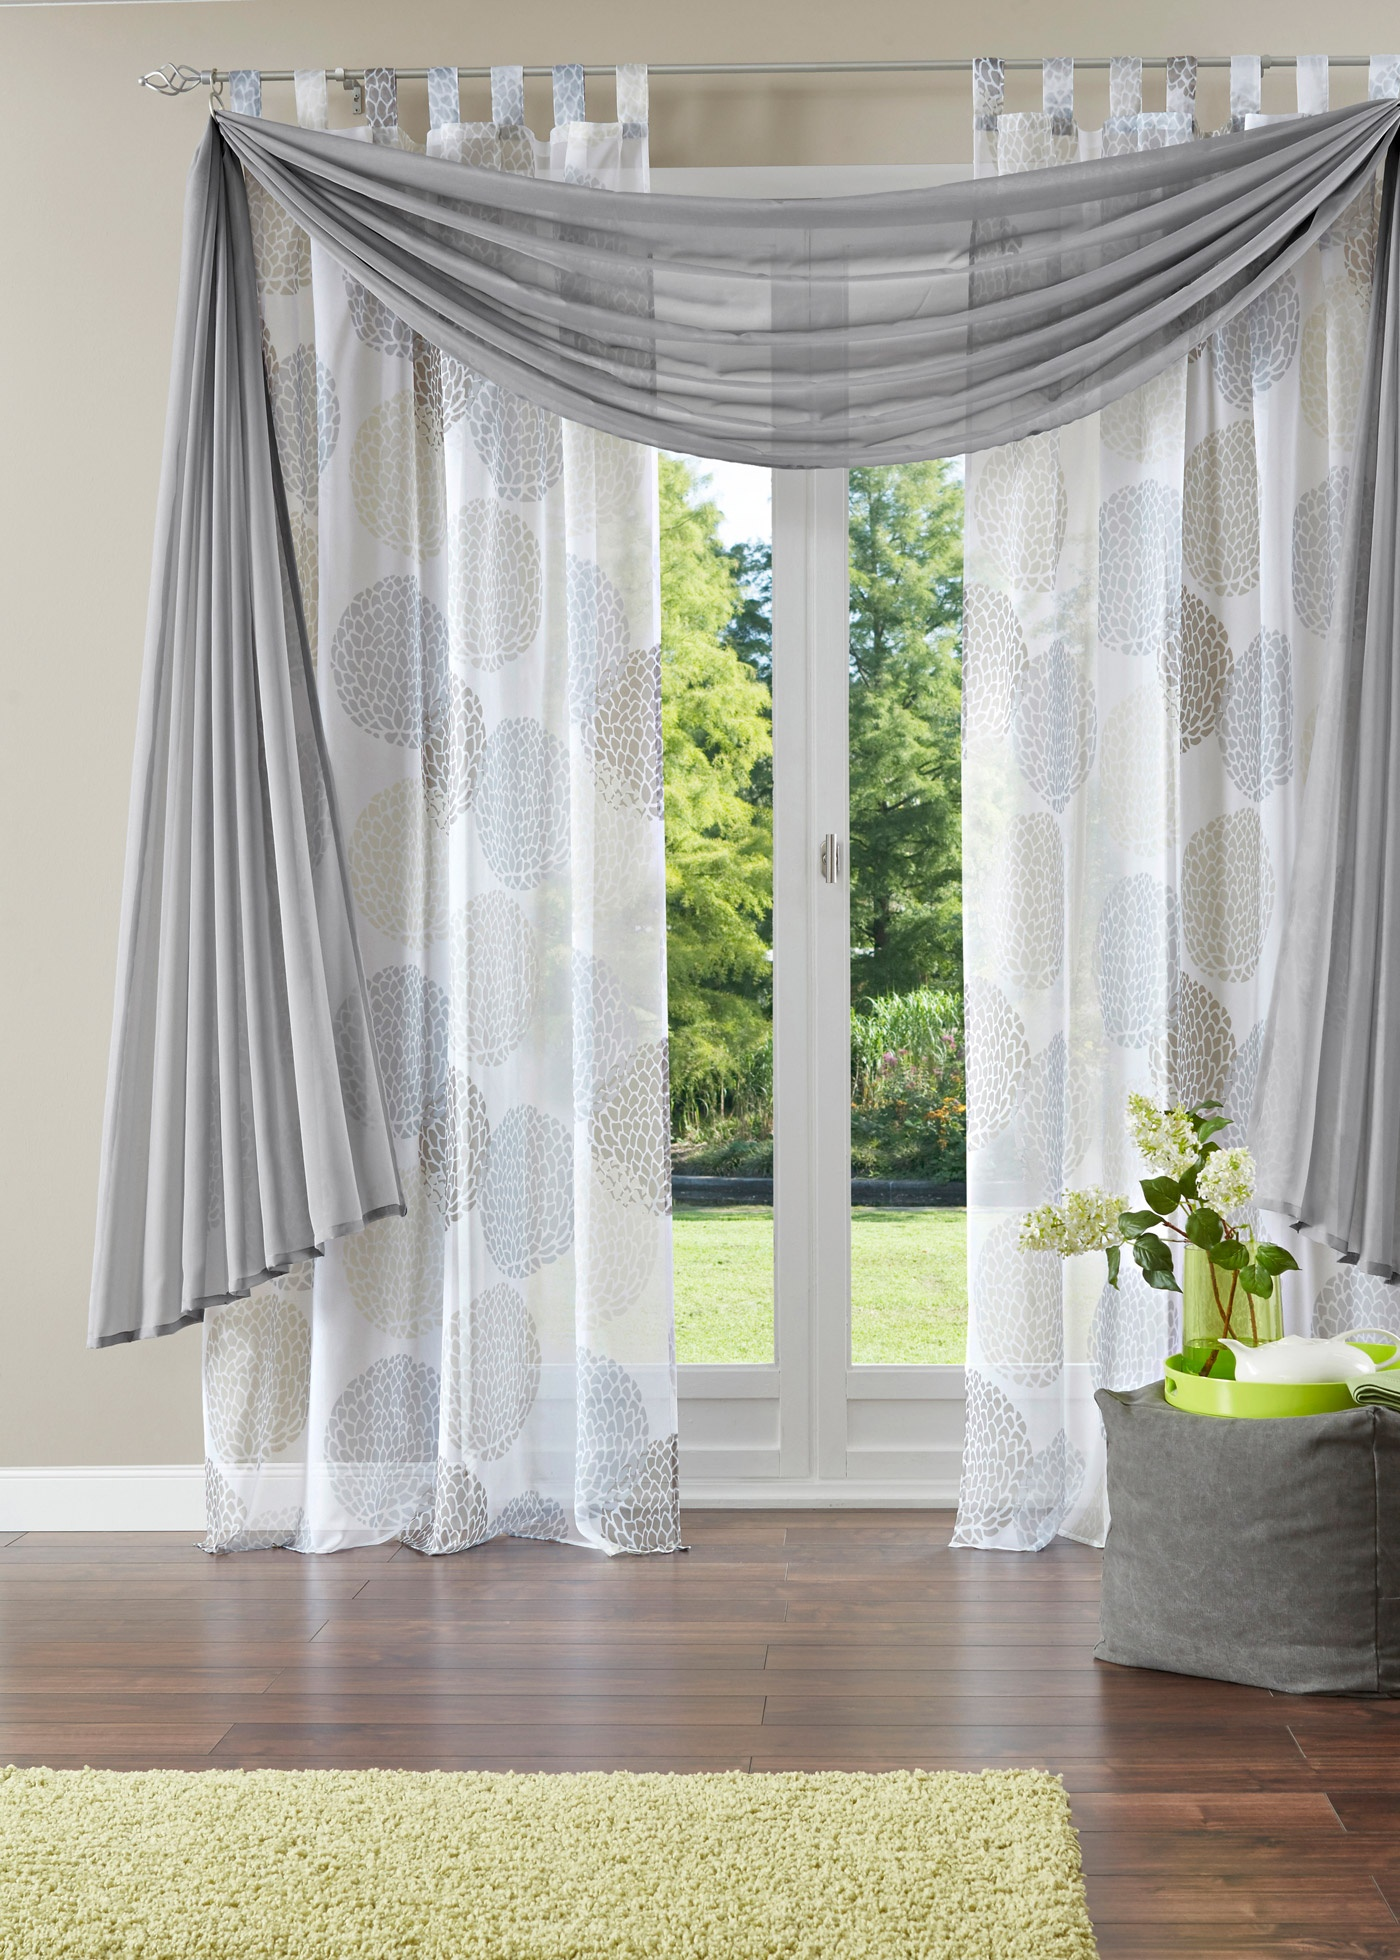 2019 Terri Tulle Pelmets Fabrics DIY Valance Curtains For Living Room  Kitchen Drapes Window Treatments Valance Curtains For Bedroom From Newcute,  ...